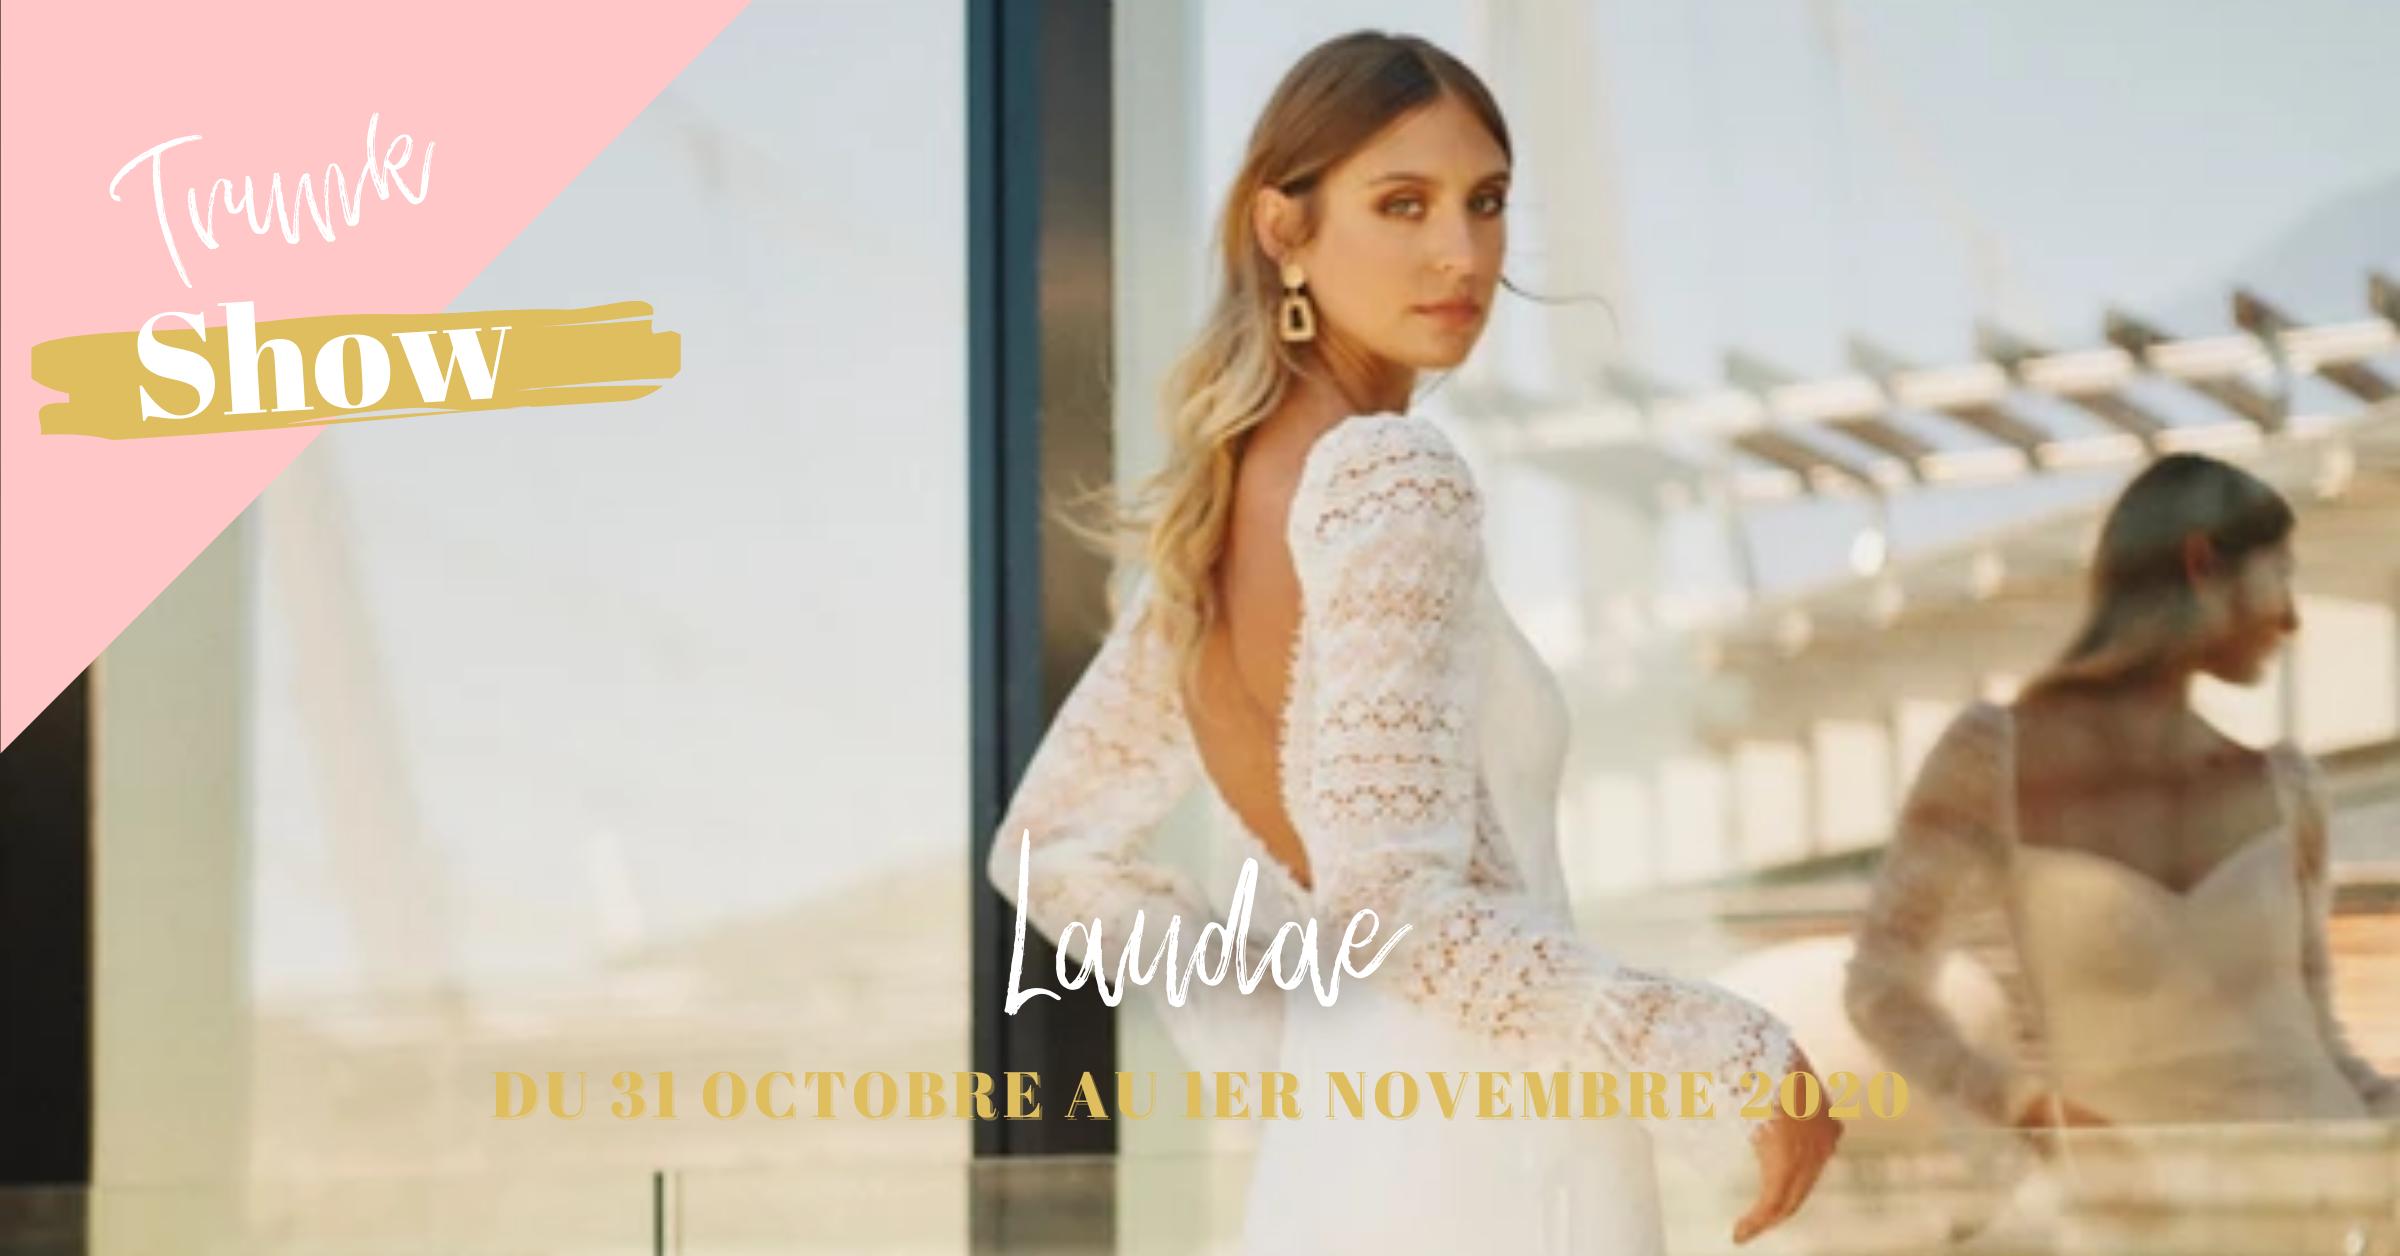 Laudae du 31 octobre au 1er novembre 2020